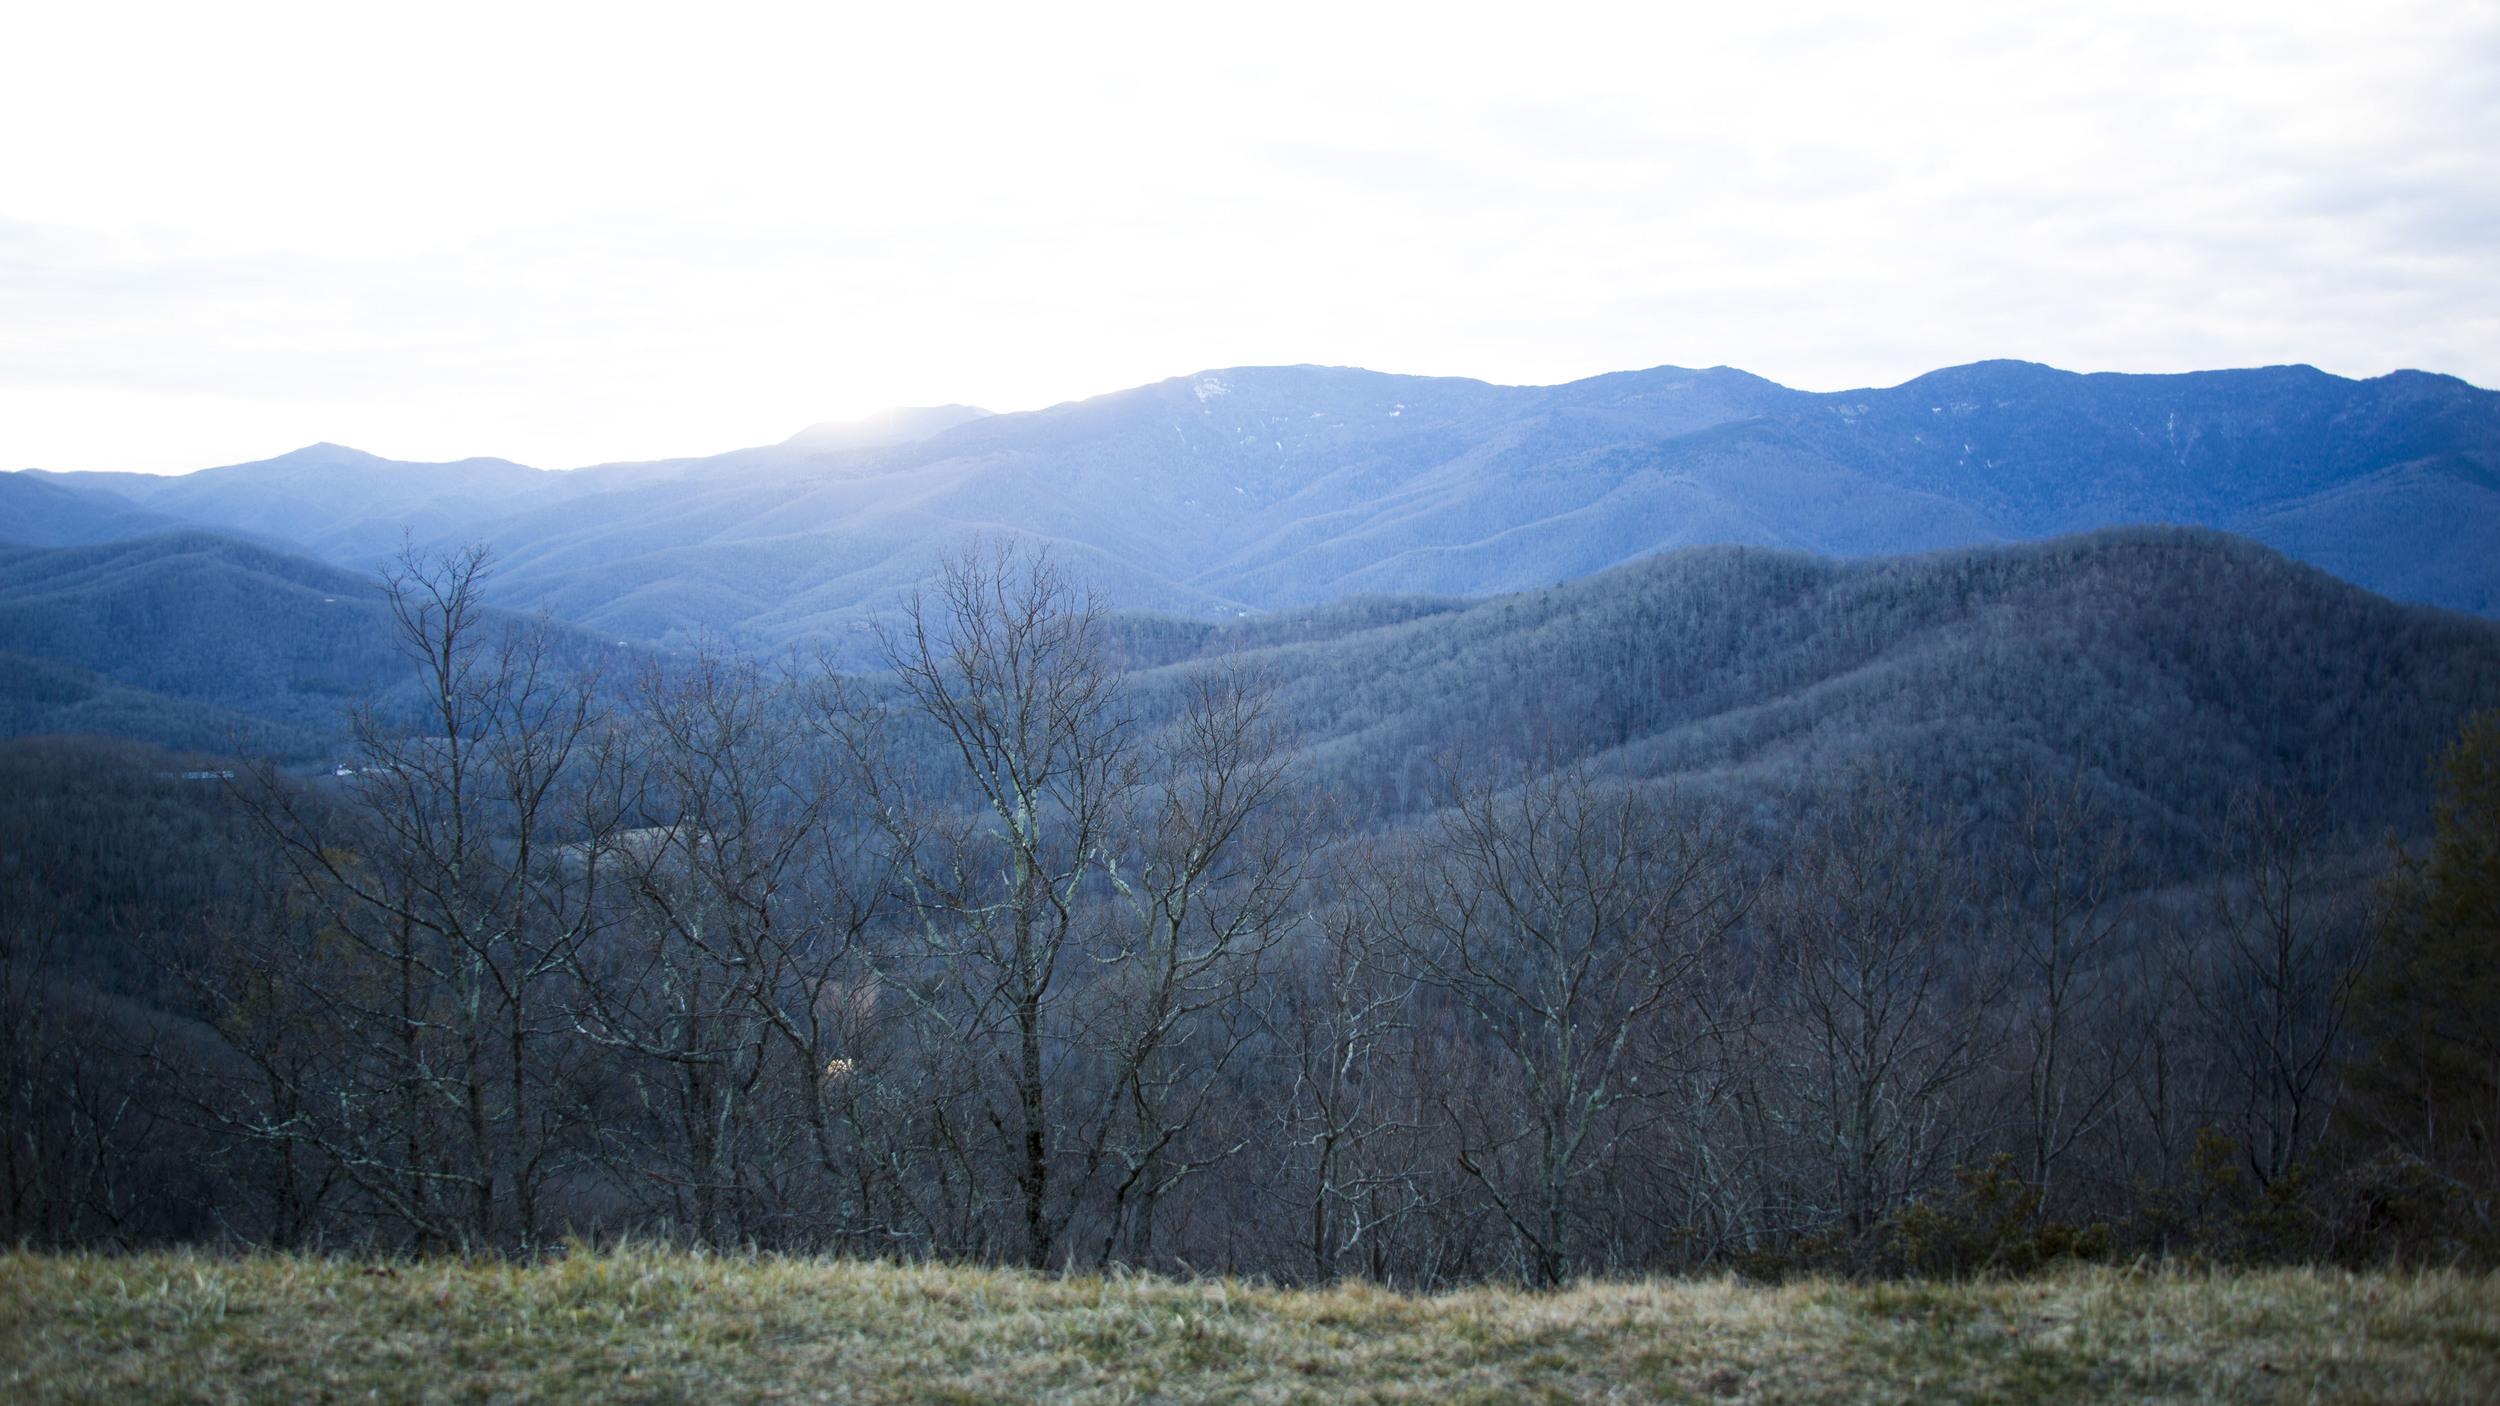 Blue Ridge Mountains in North Carolina.